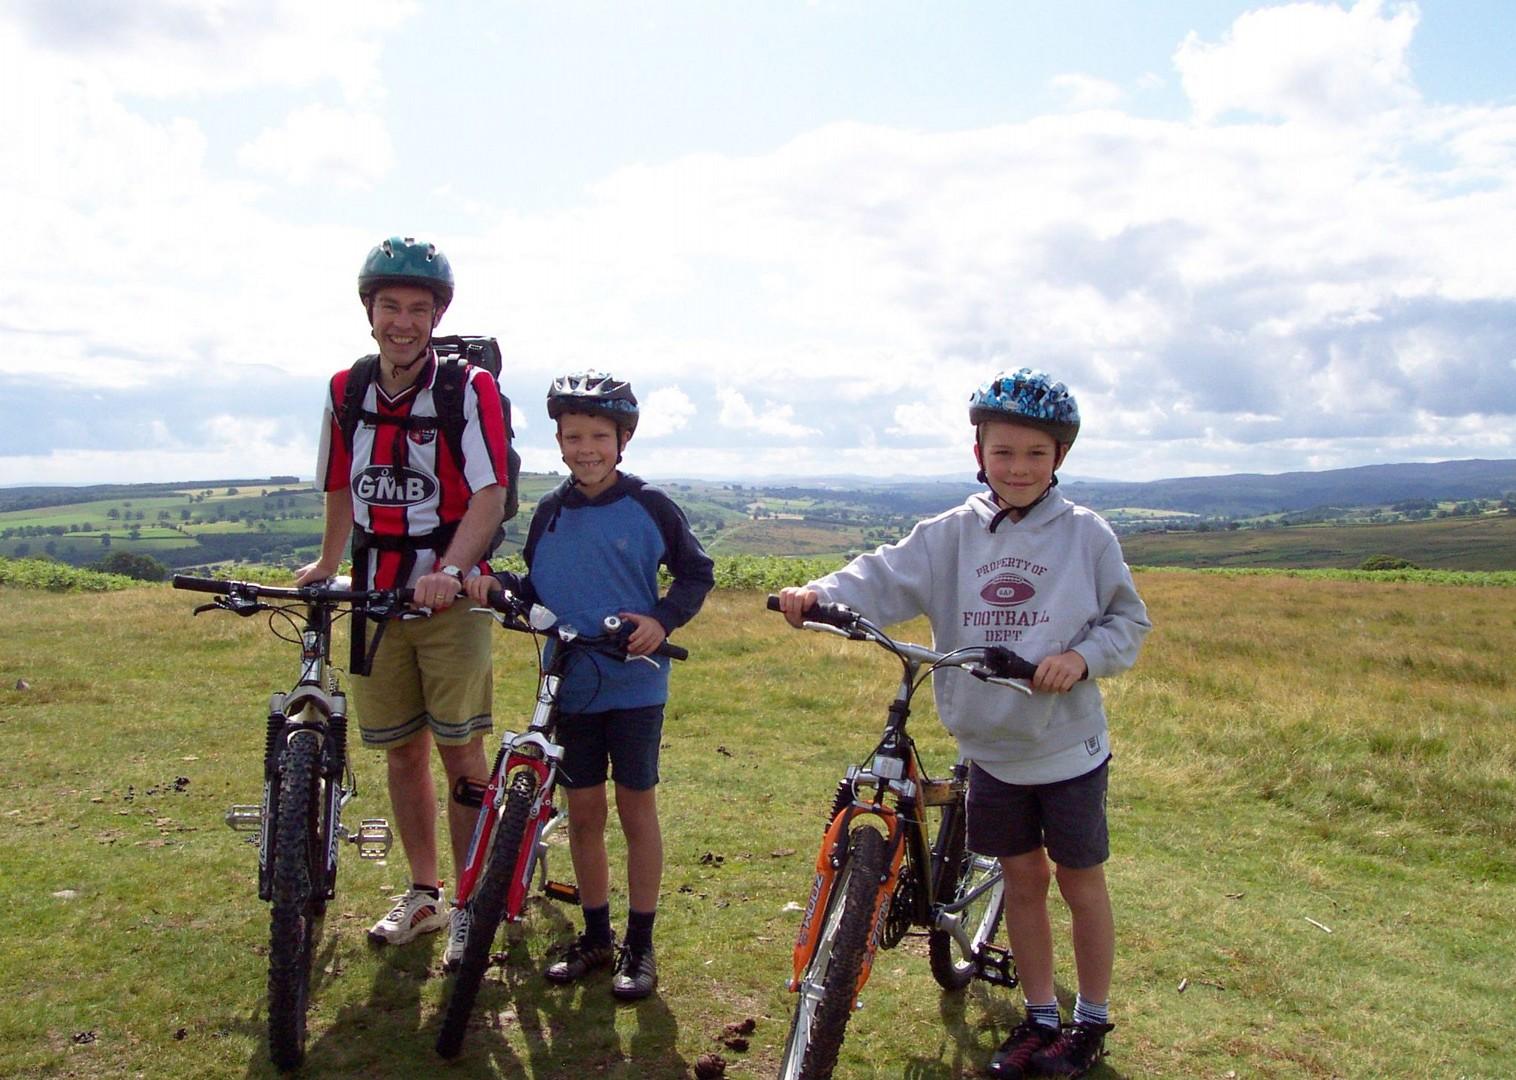 bike-skills-lake-district-guided-holiday.jpg - UK - Lake District - Bike Skills - Family Cycling